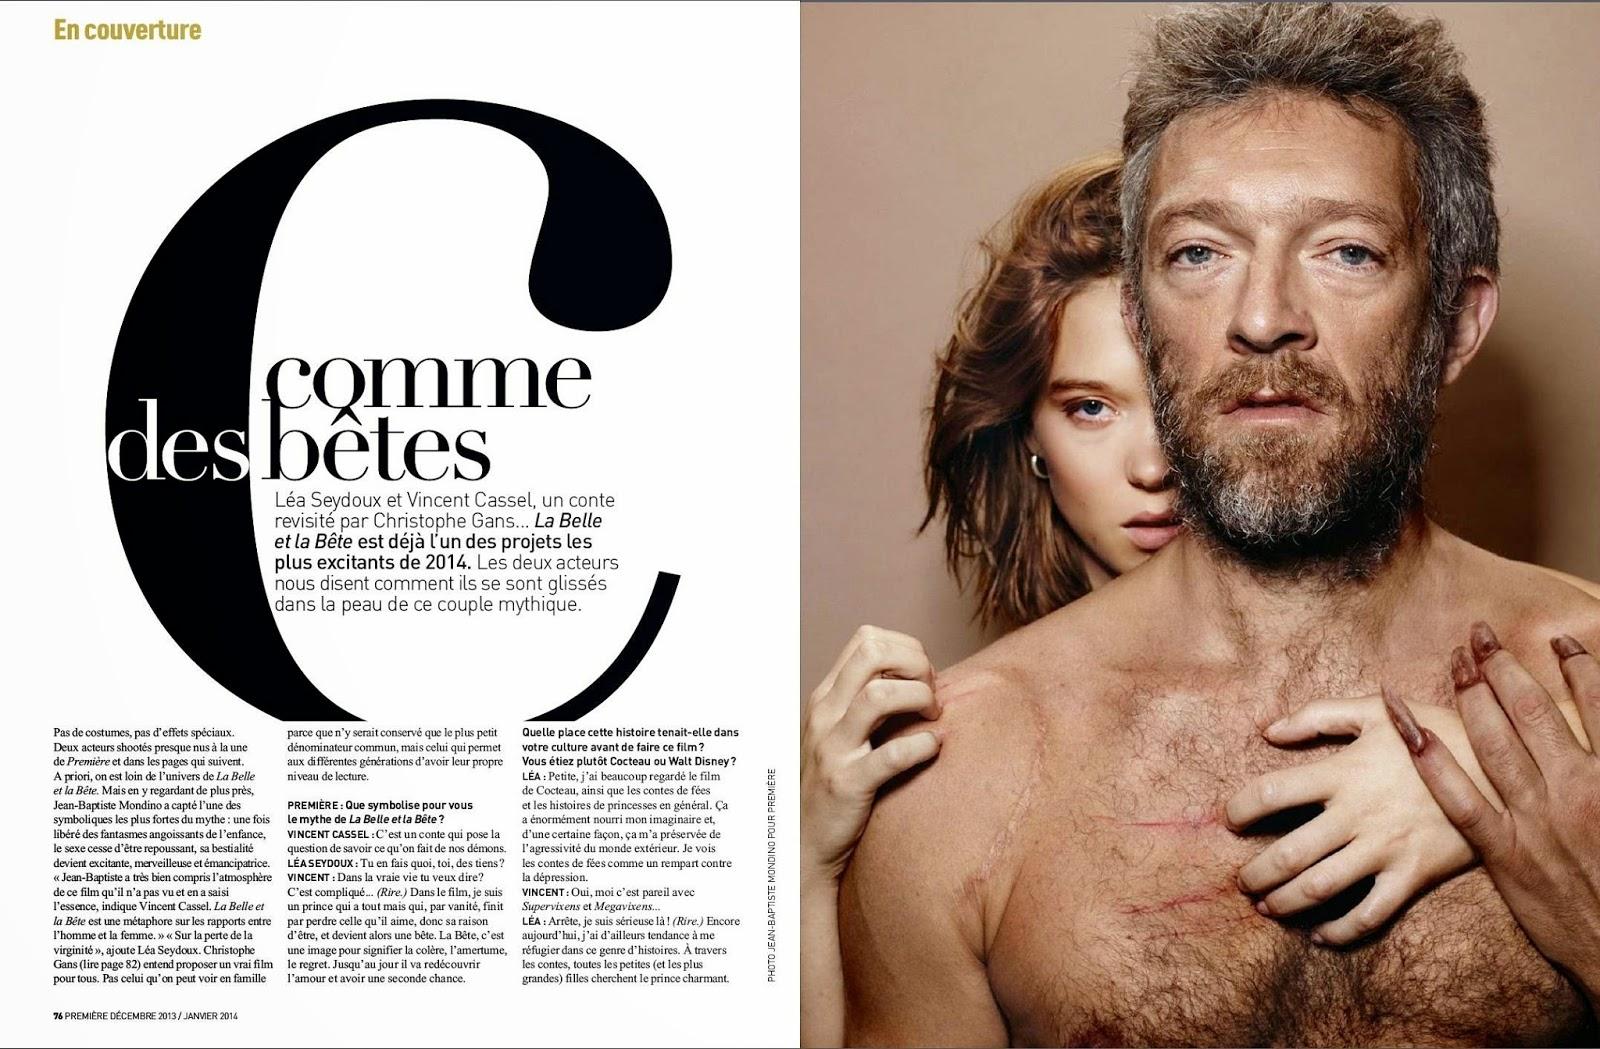 Deborah watling topless